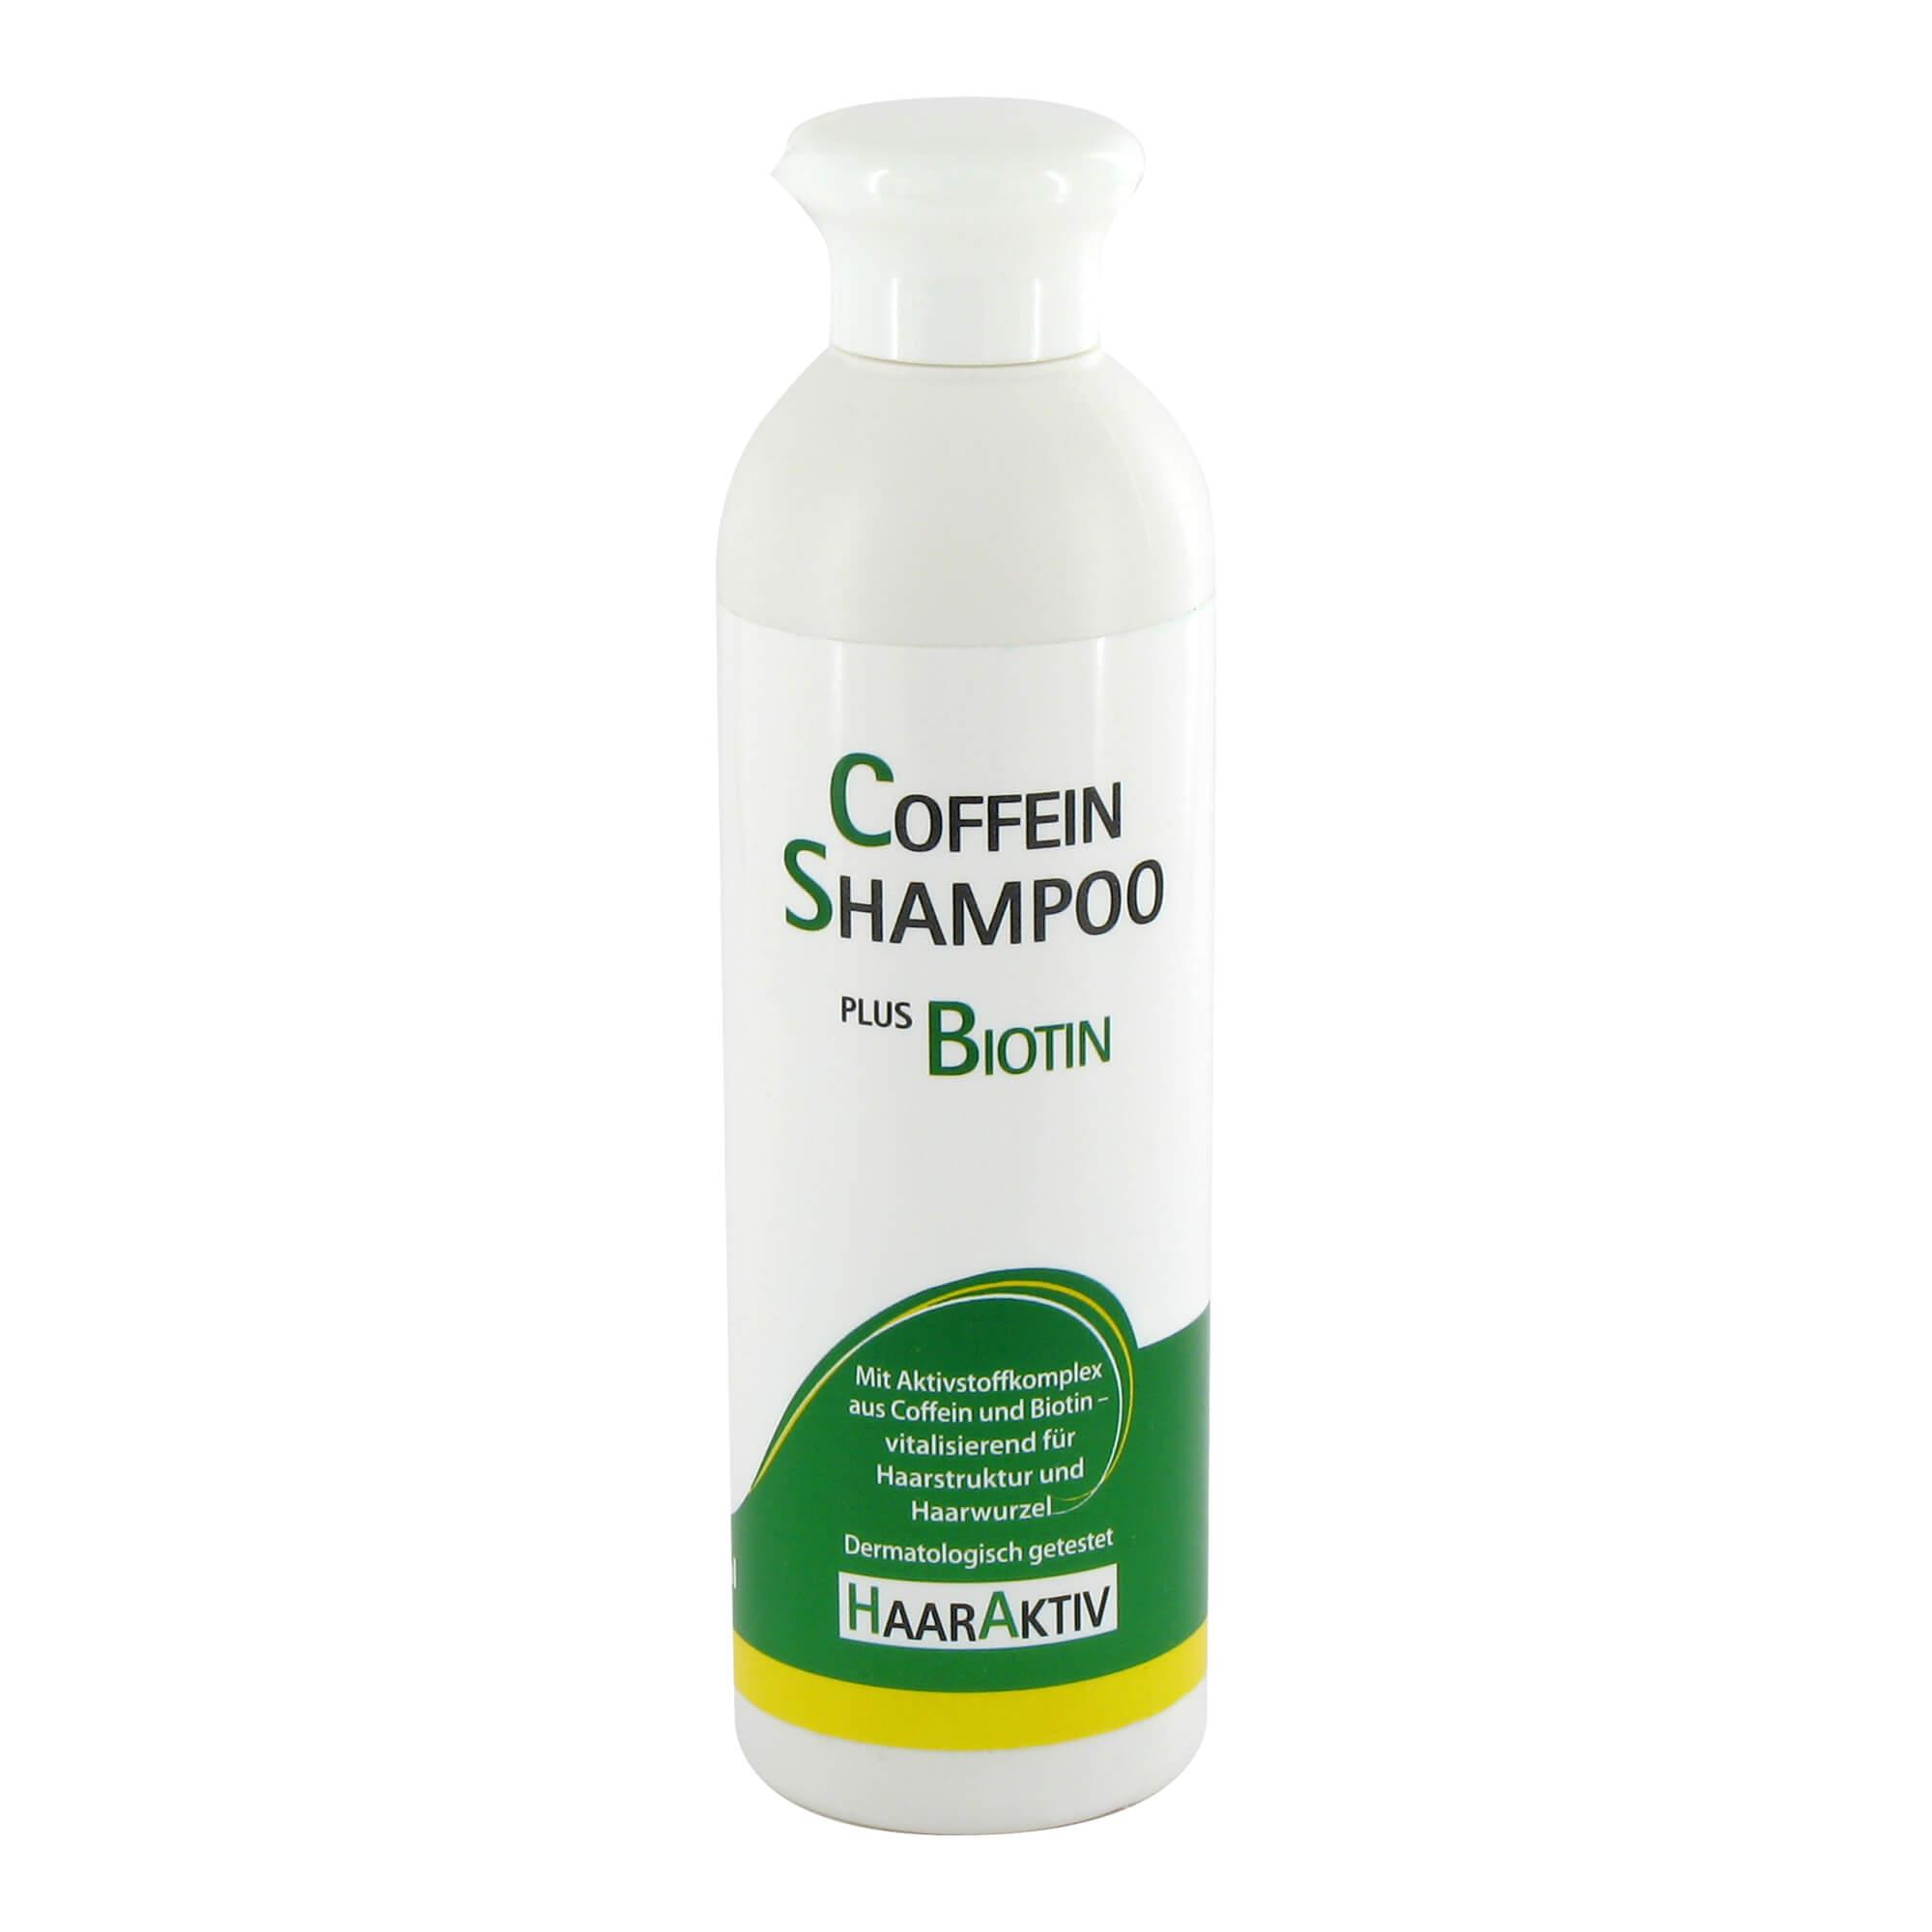 HaarAktiv Coffein Shampoo + Biotin